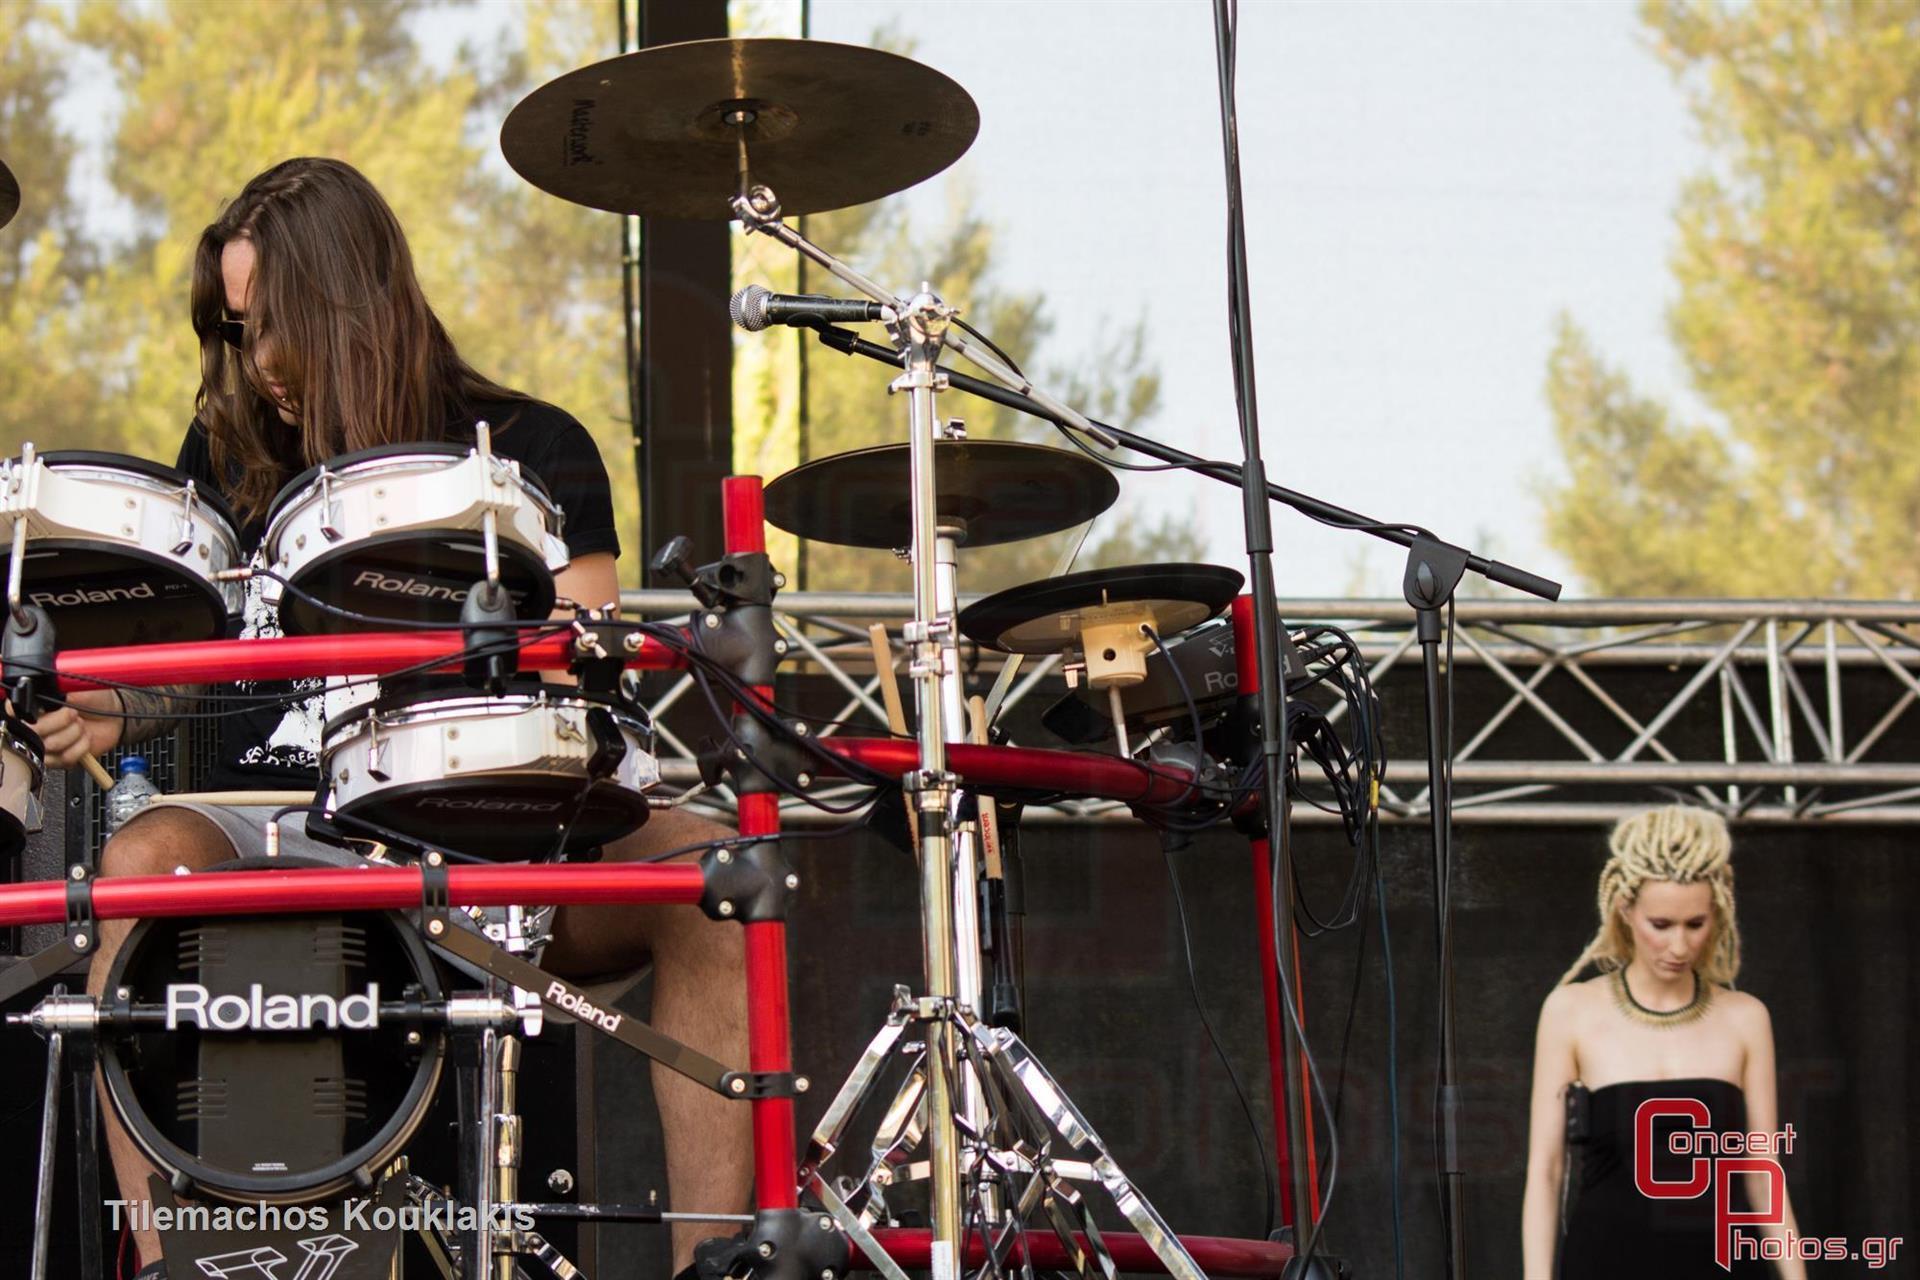 Chaostar-Chaostar photographer: Tilemachos Kouklakis - concertphotos_-0175